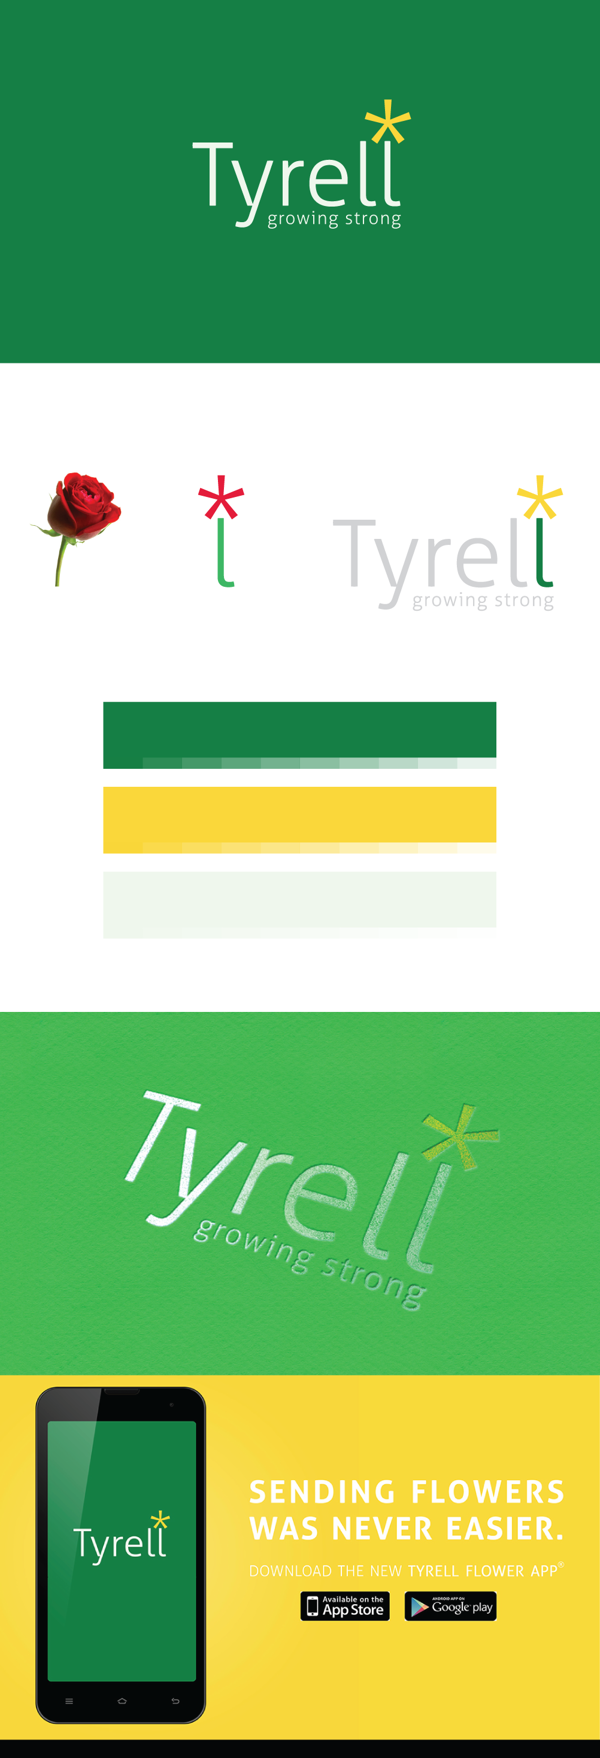 tyrell-got-agence-communication-st-barth